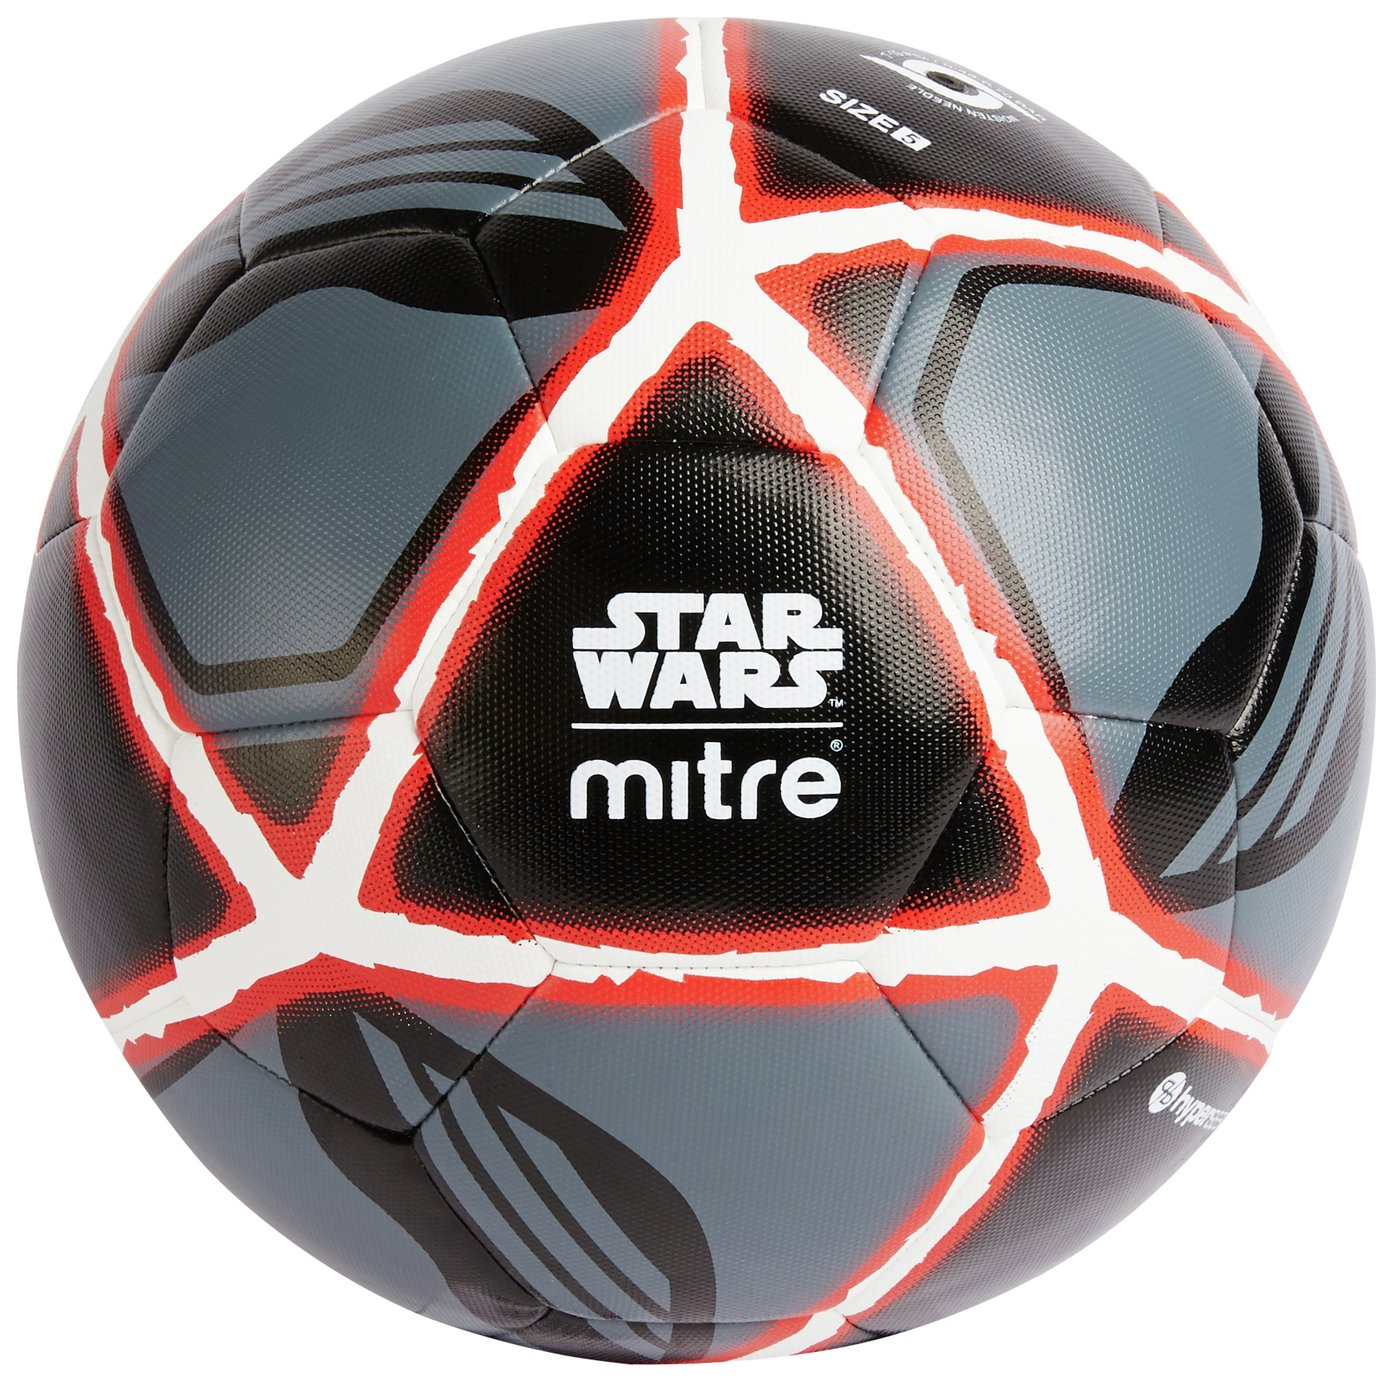 Mitre Star Wars Kylo Ren Football - Black